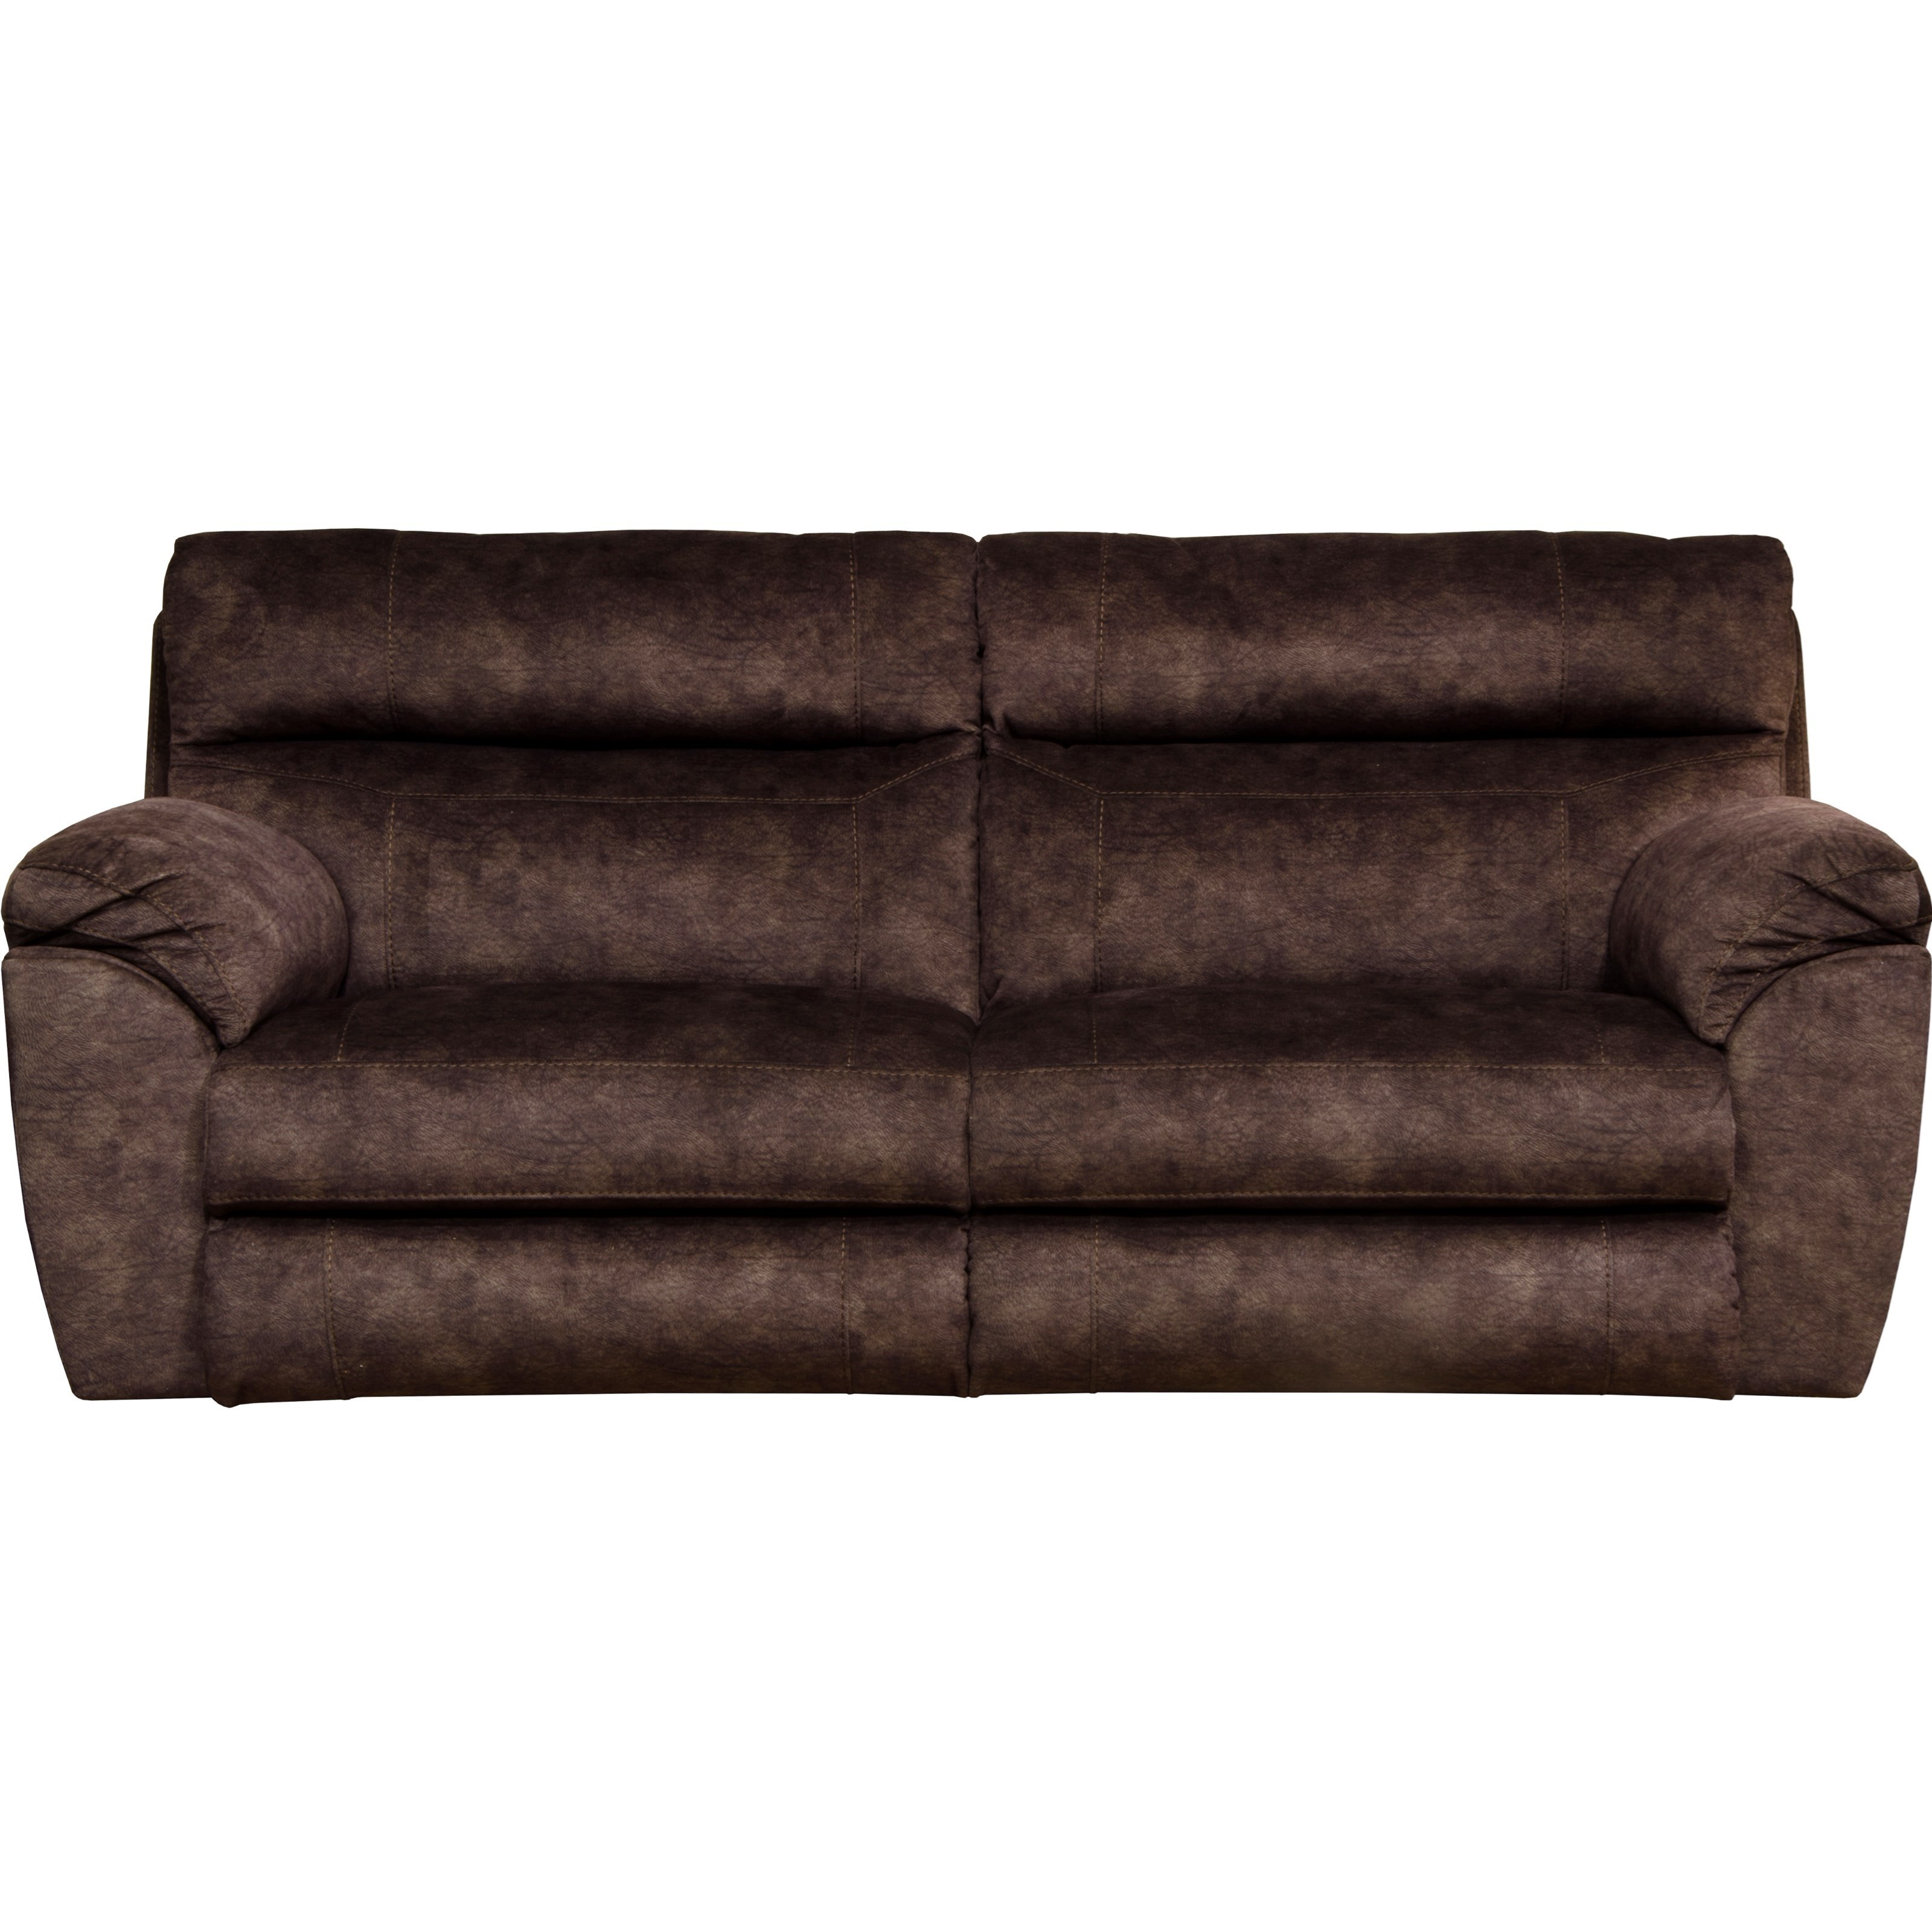 Sedona Power Lay Flat Reclining Sofa by Catnapper at Northeast Factory Direct